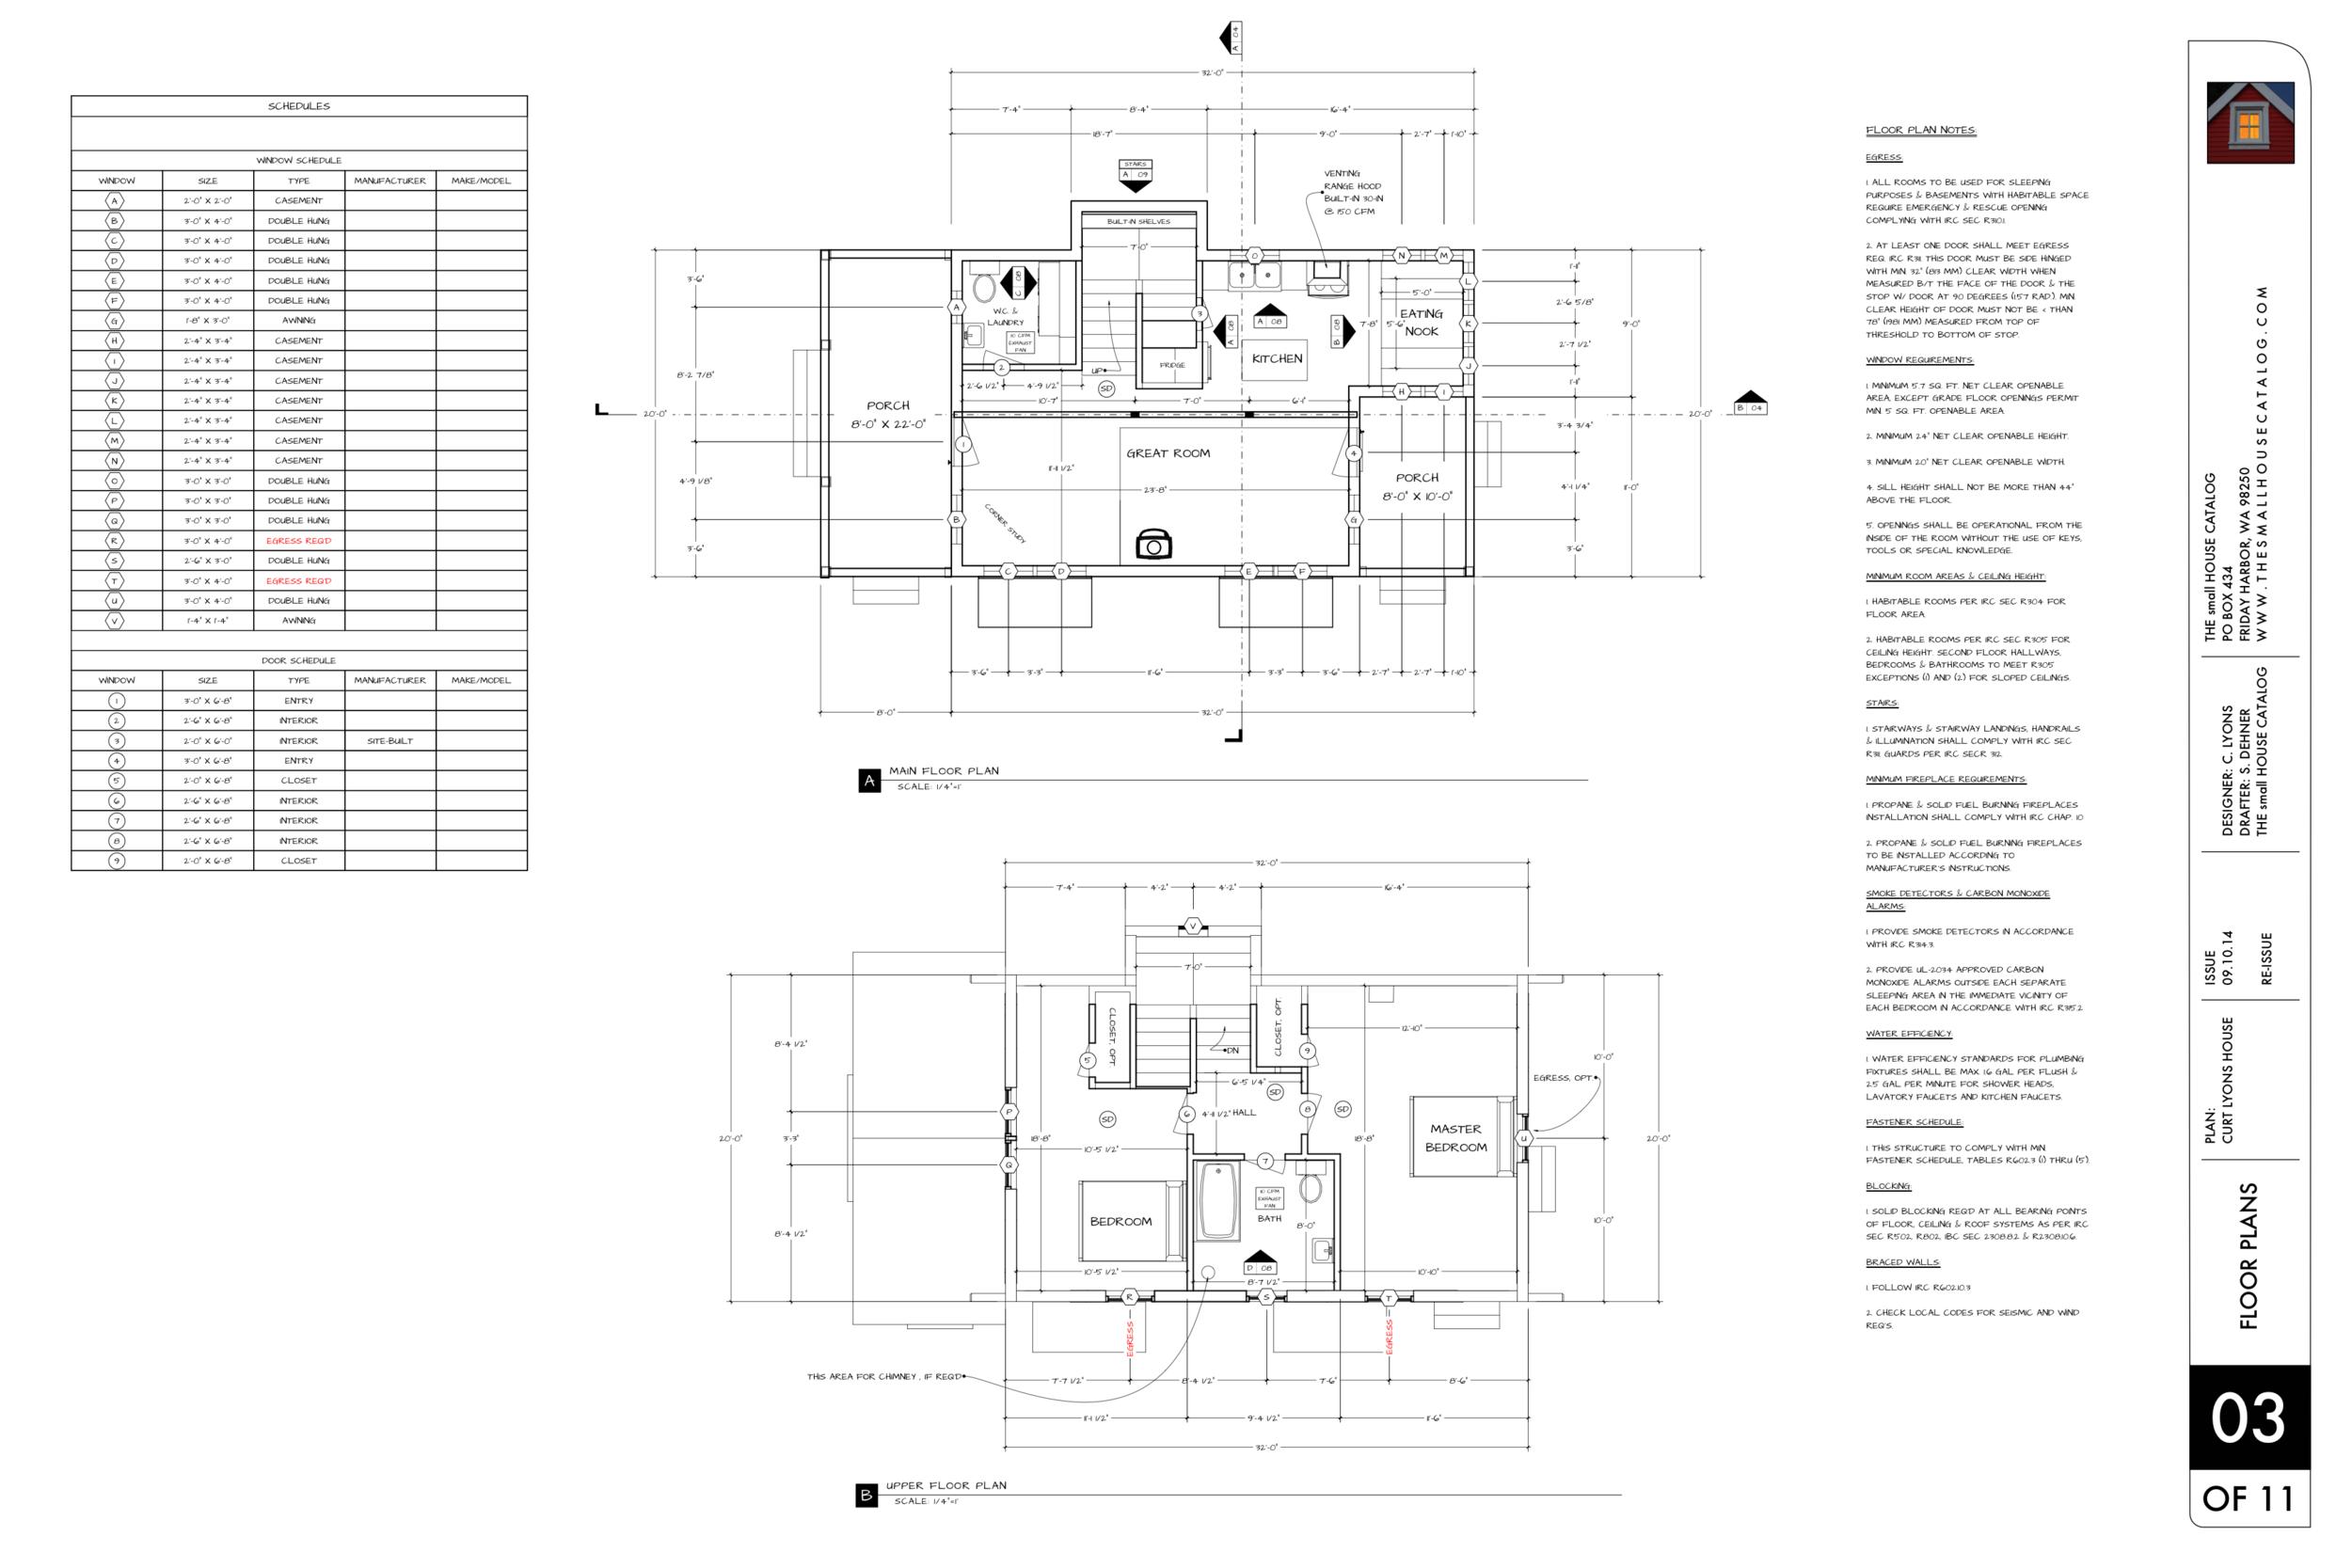 cottonwood cottage floor plan 1.5 story